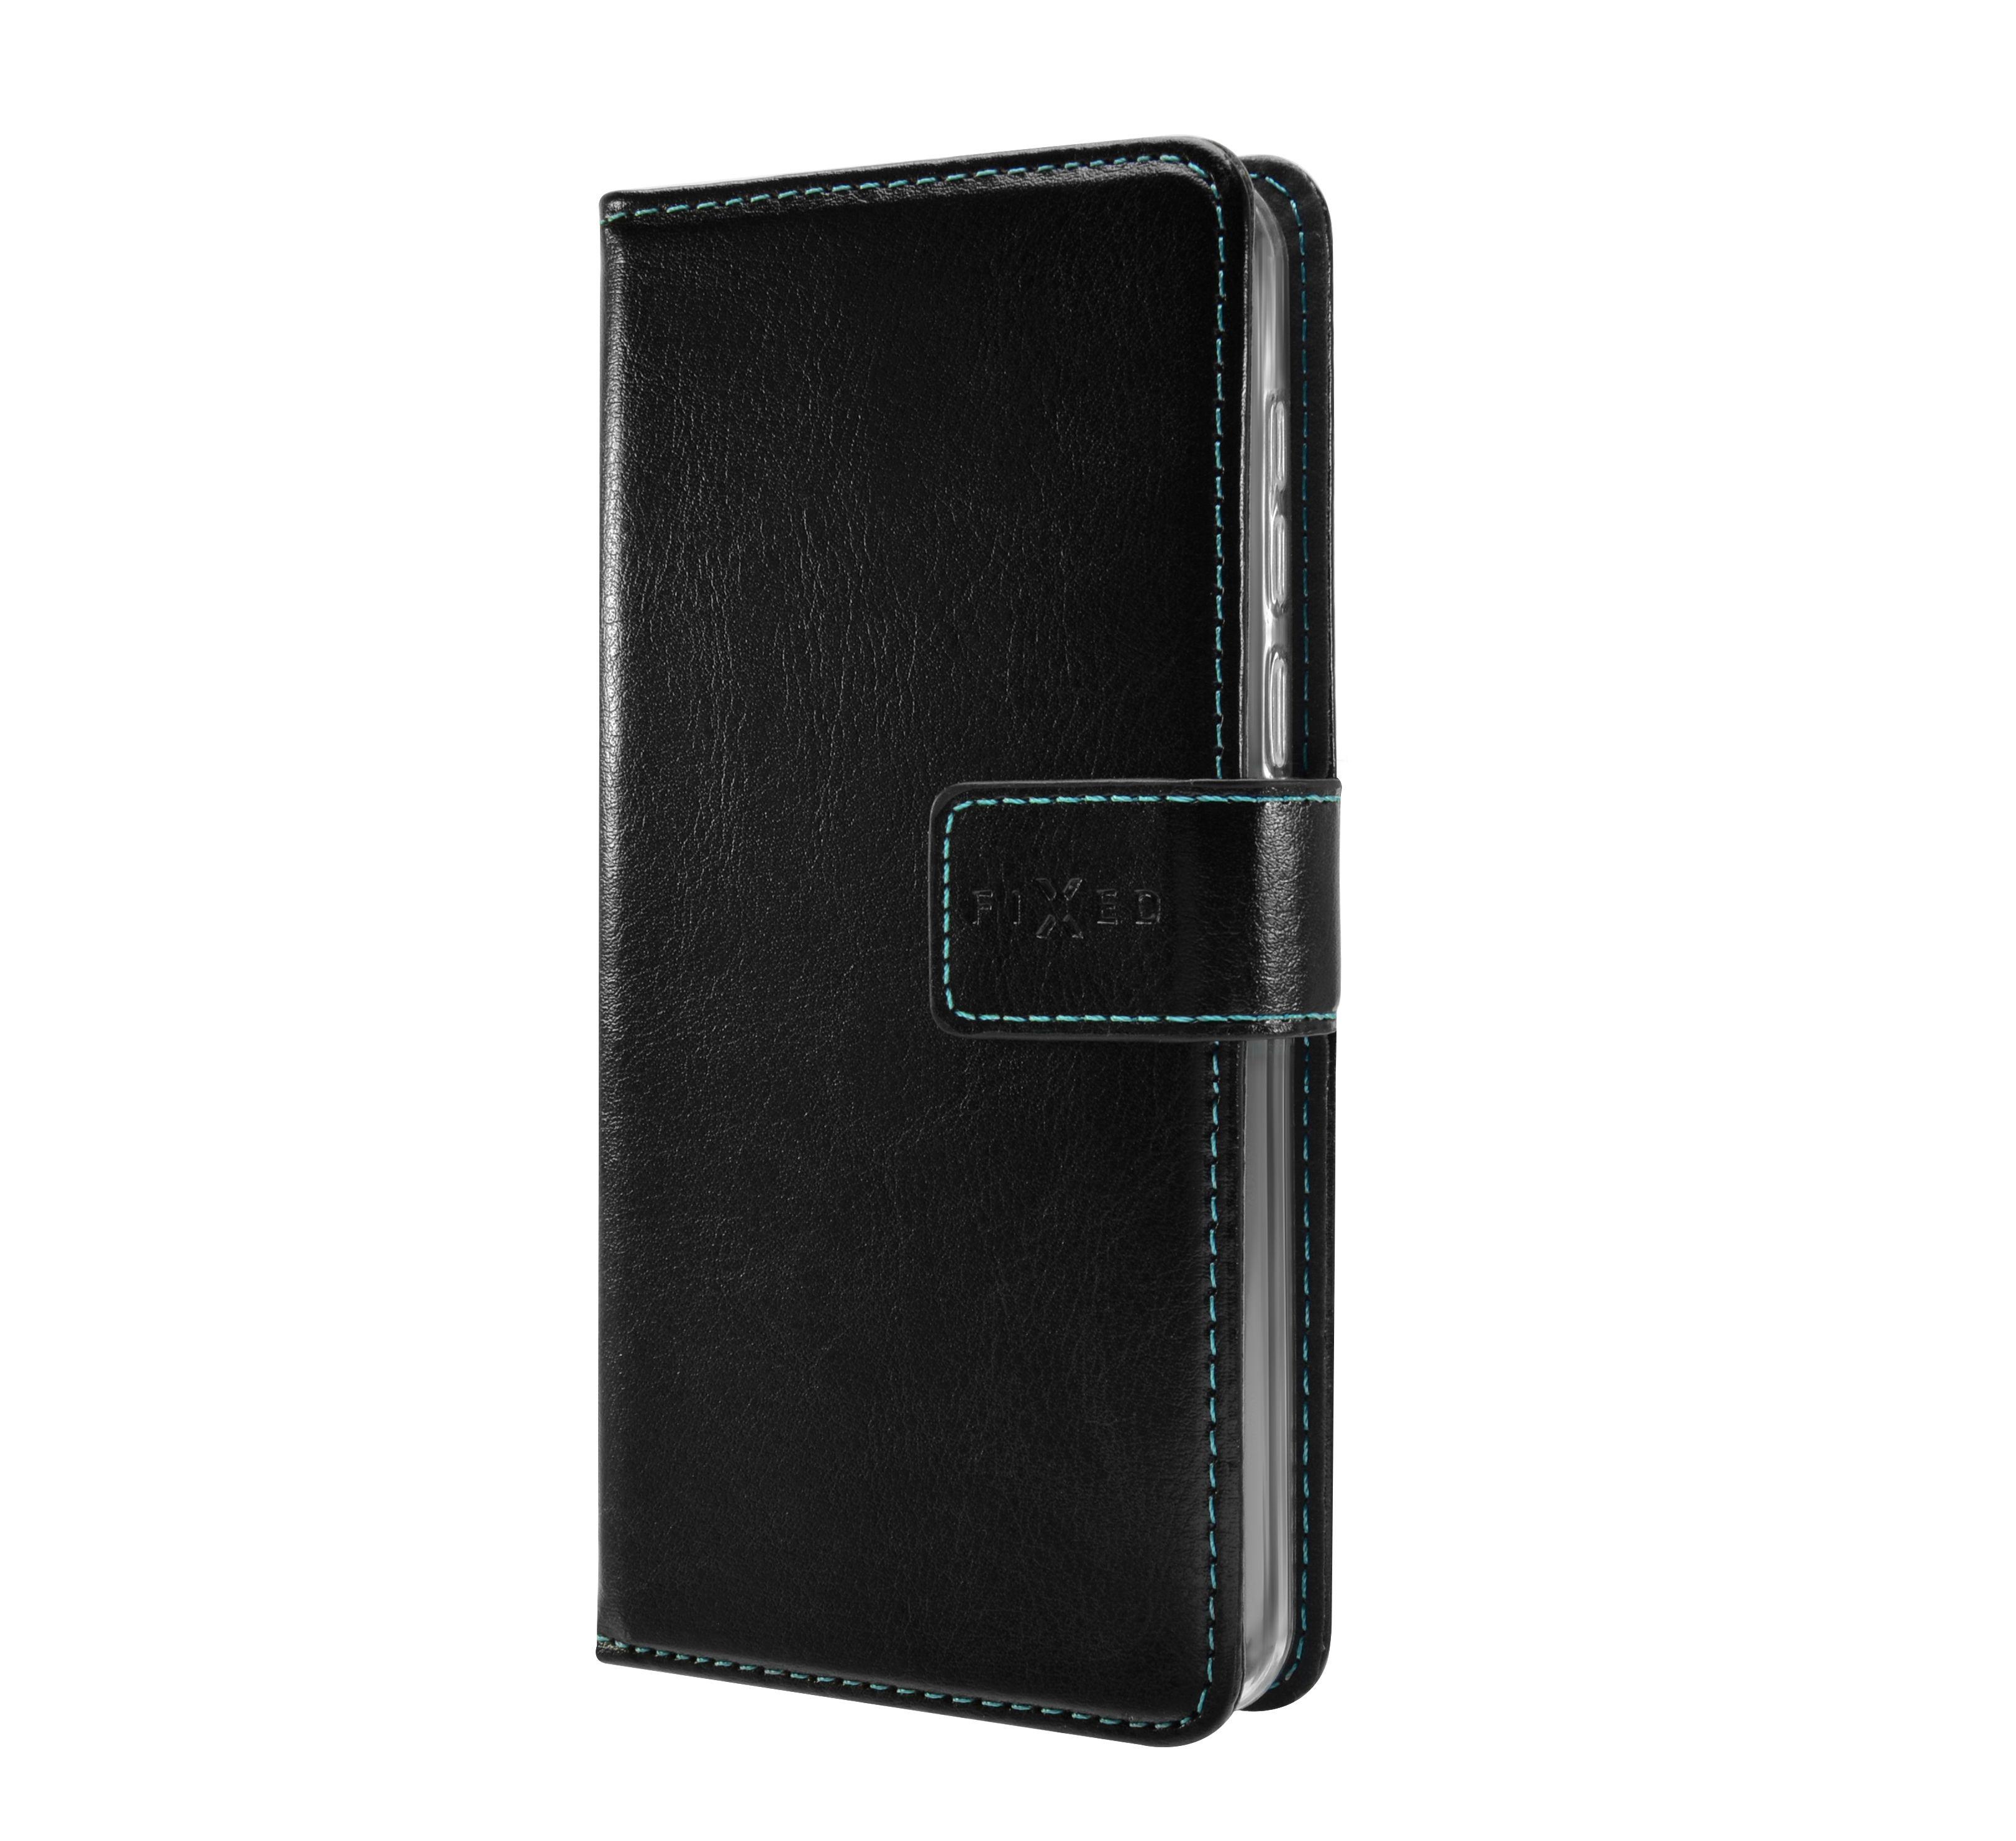 FIXED Opus flipové pouzdro pro Huawei Nova 3i, černé